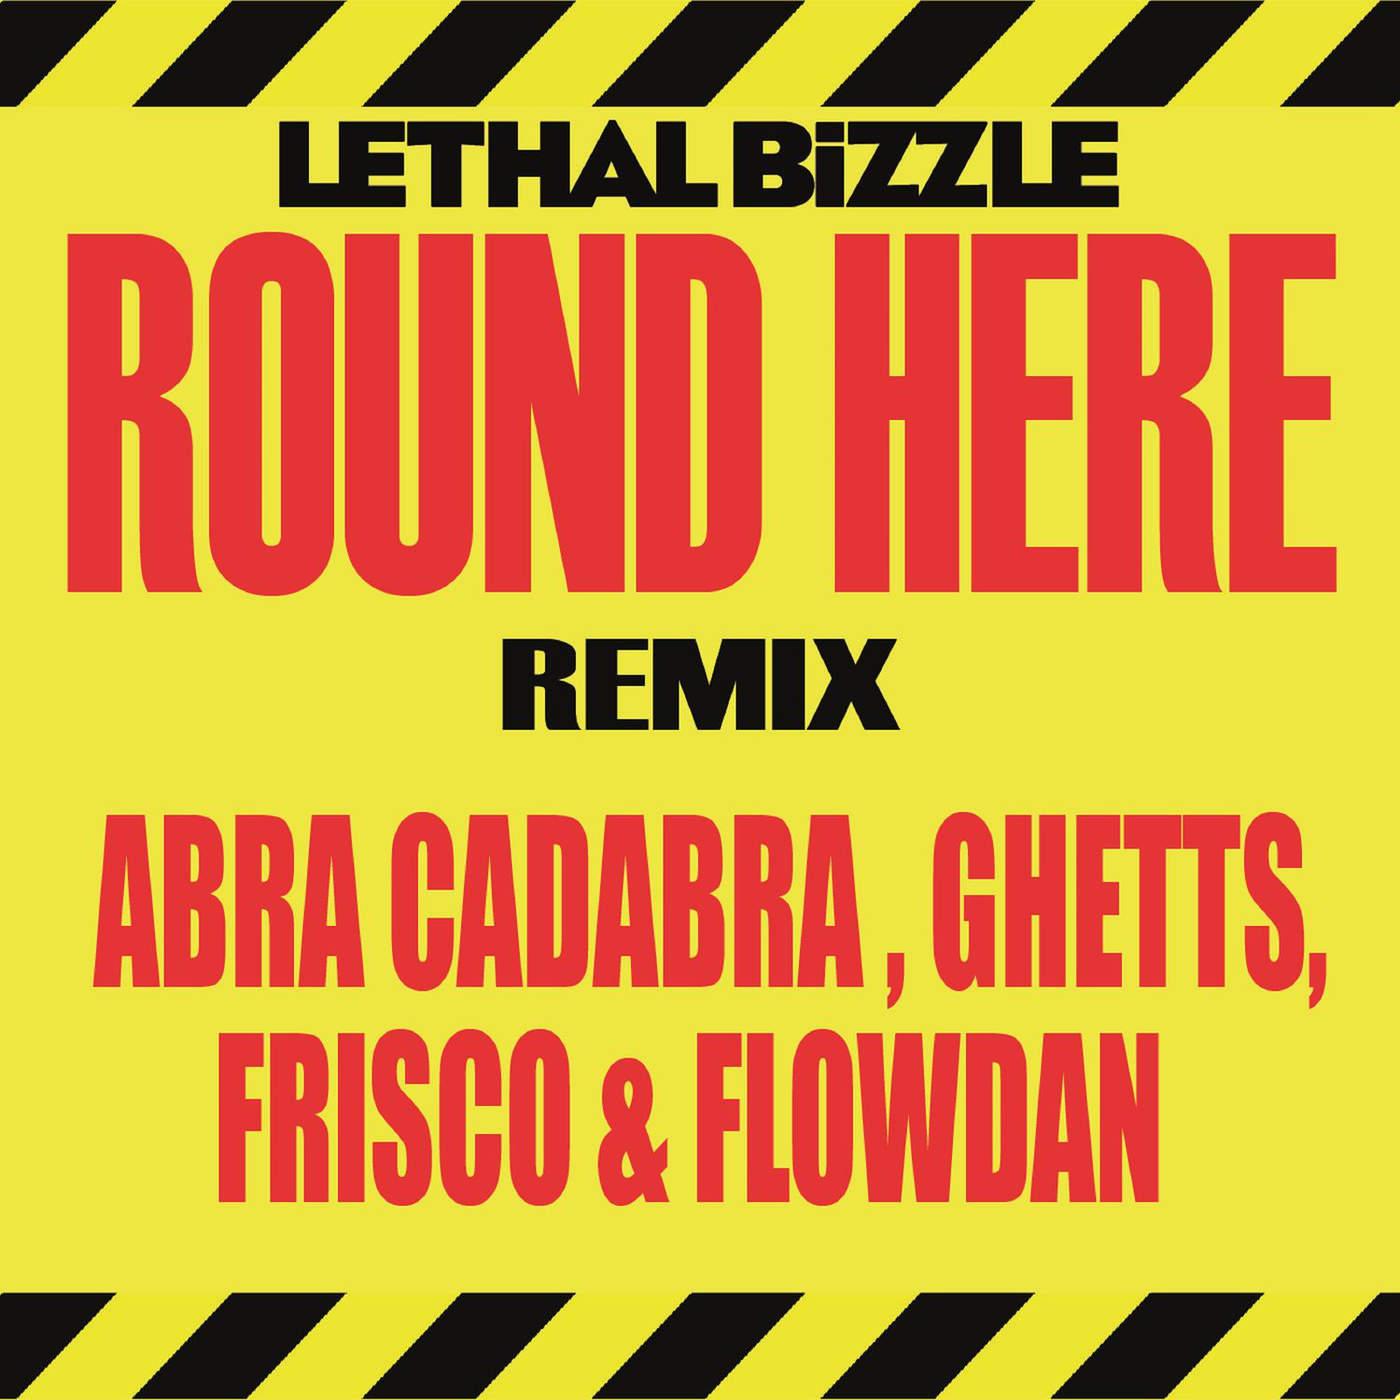 Lethal Bizzle - Round Here (Remix) [feat. Abra Cadabra, Ghetts, Frisco & Flowdan] - Single Cover